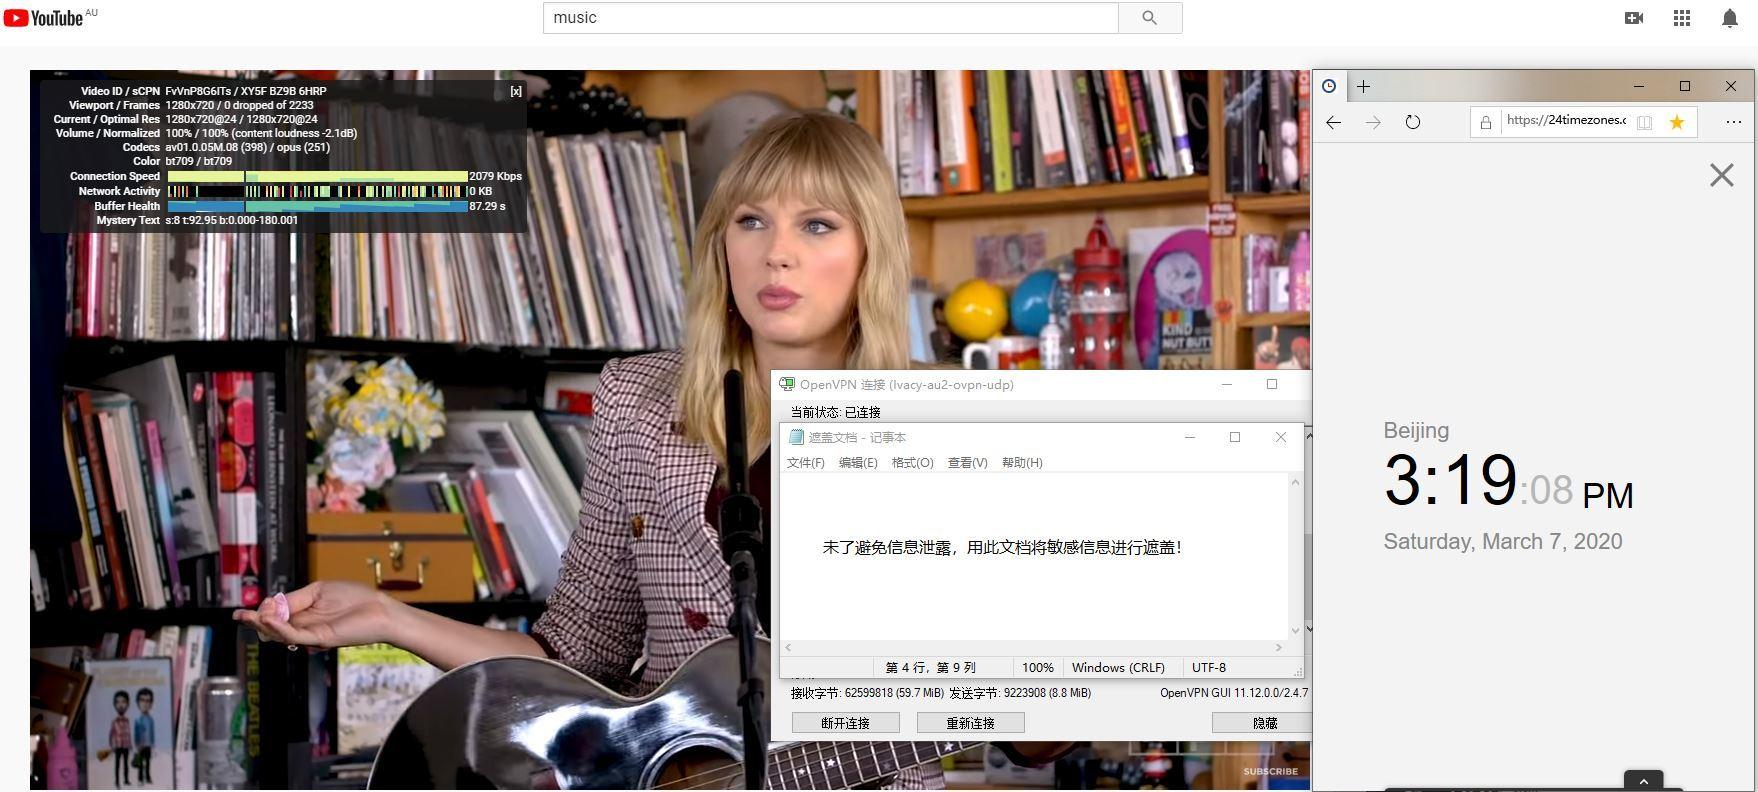 Windows10-IvacyVPN-OpenVPN-AU2-中国VPN翻墙-科学上网-Youtube测速-20200307.jpg